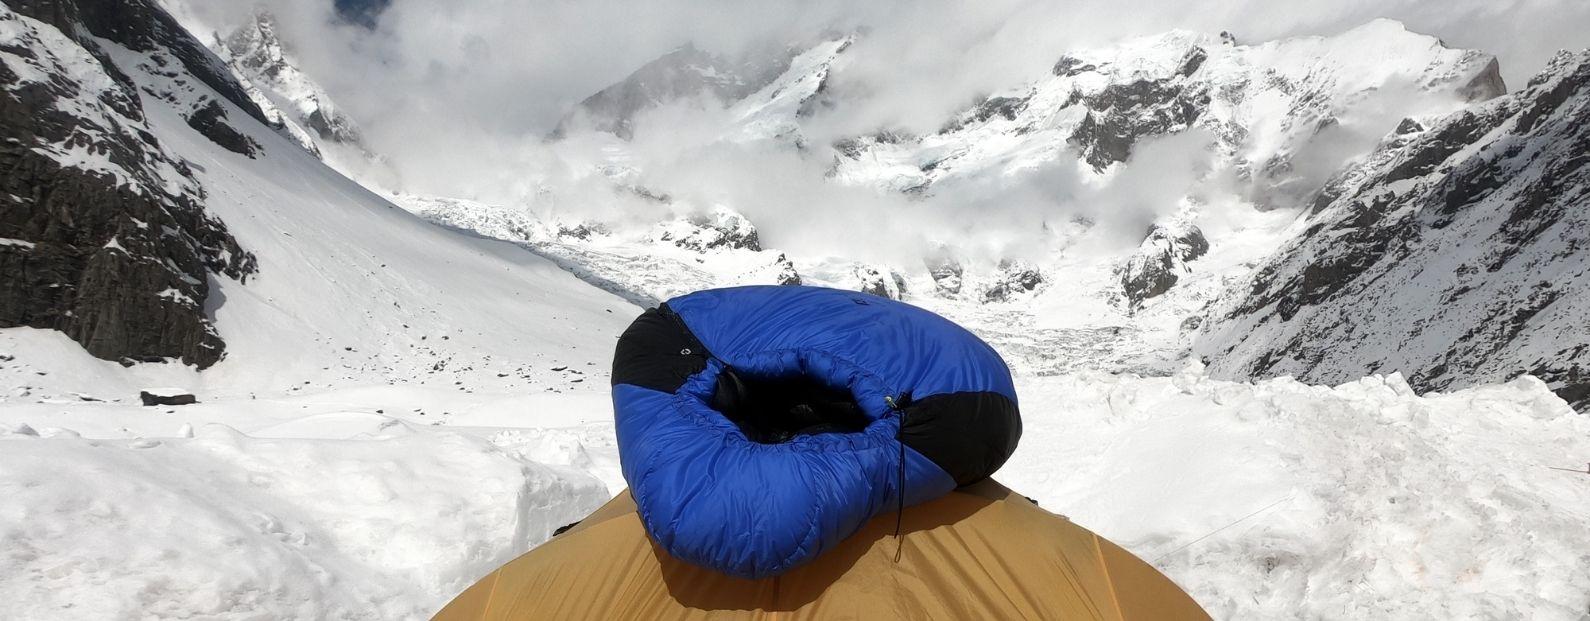 Our new Excusitic 1500 sleeping bag tested in Karakoram